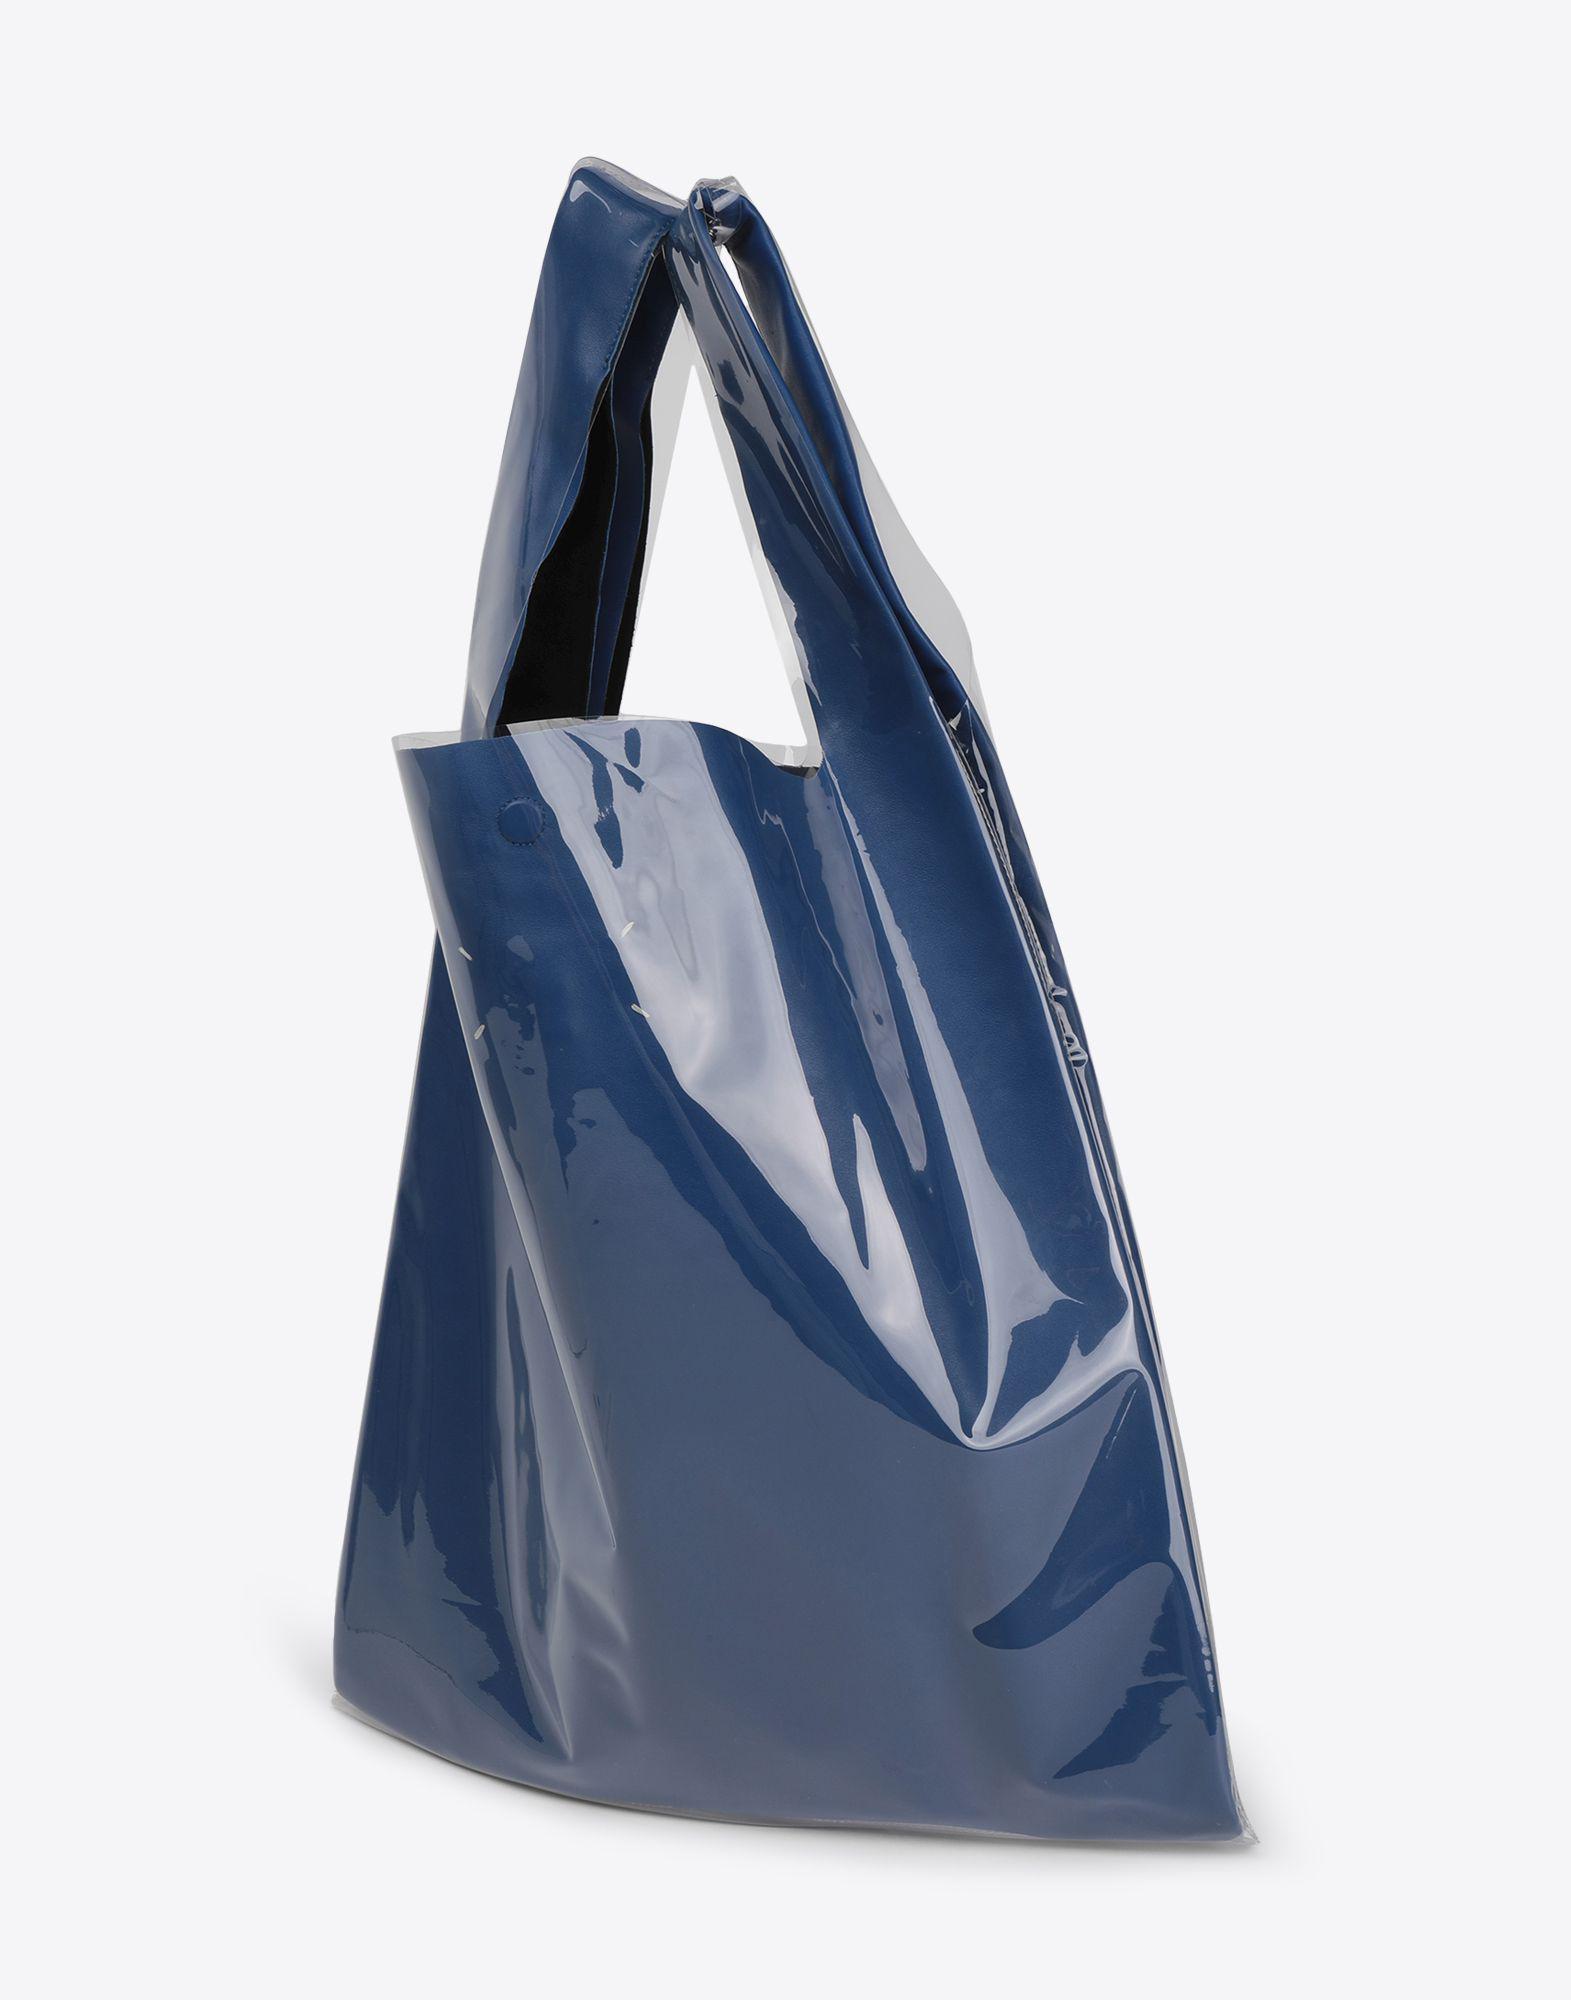 60215c0ab36ee Maison Margiela Pvc Coated Leather Shopper in Blue for Men - Lyst